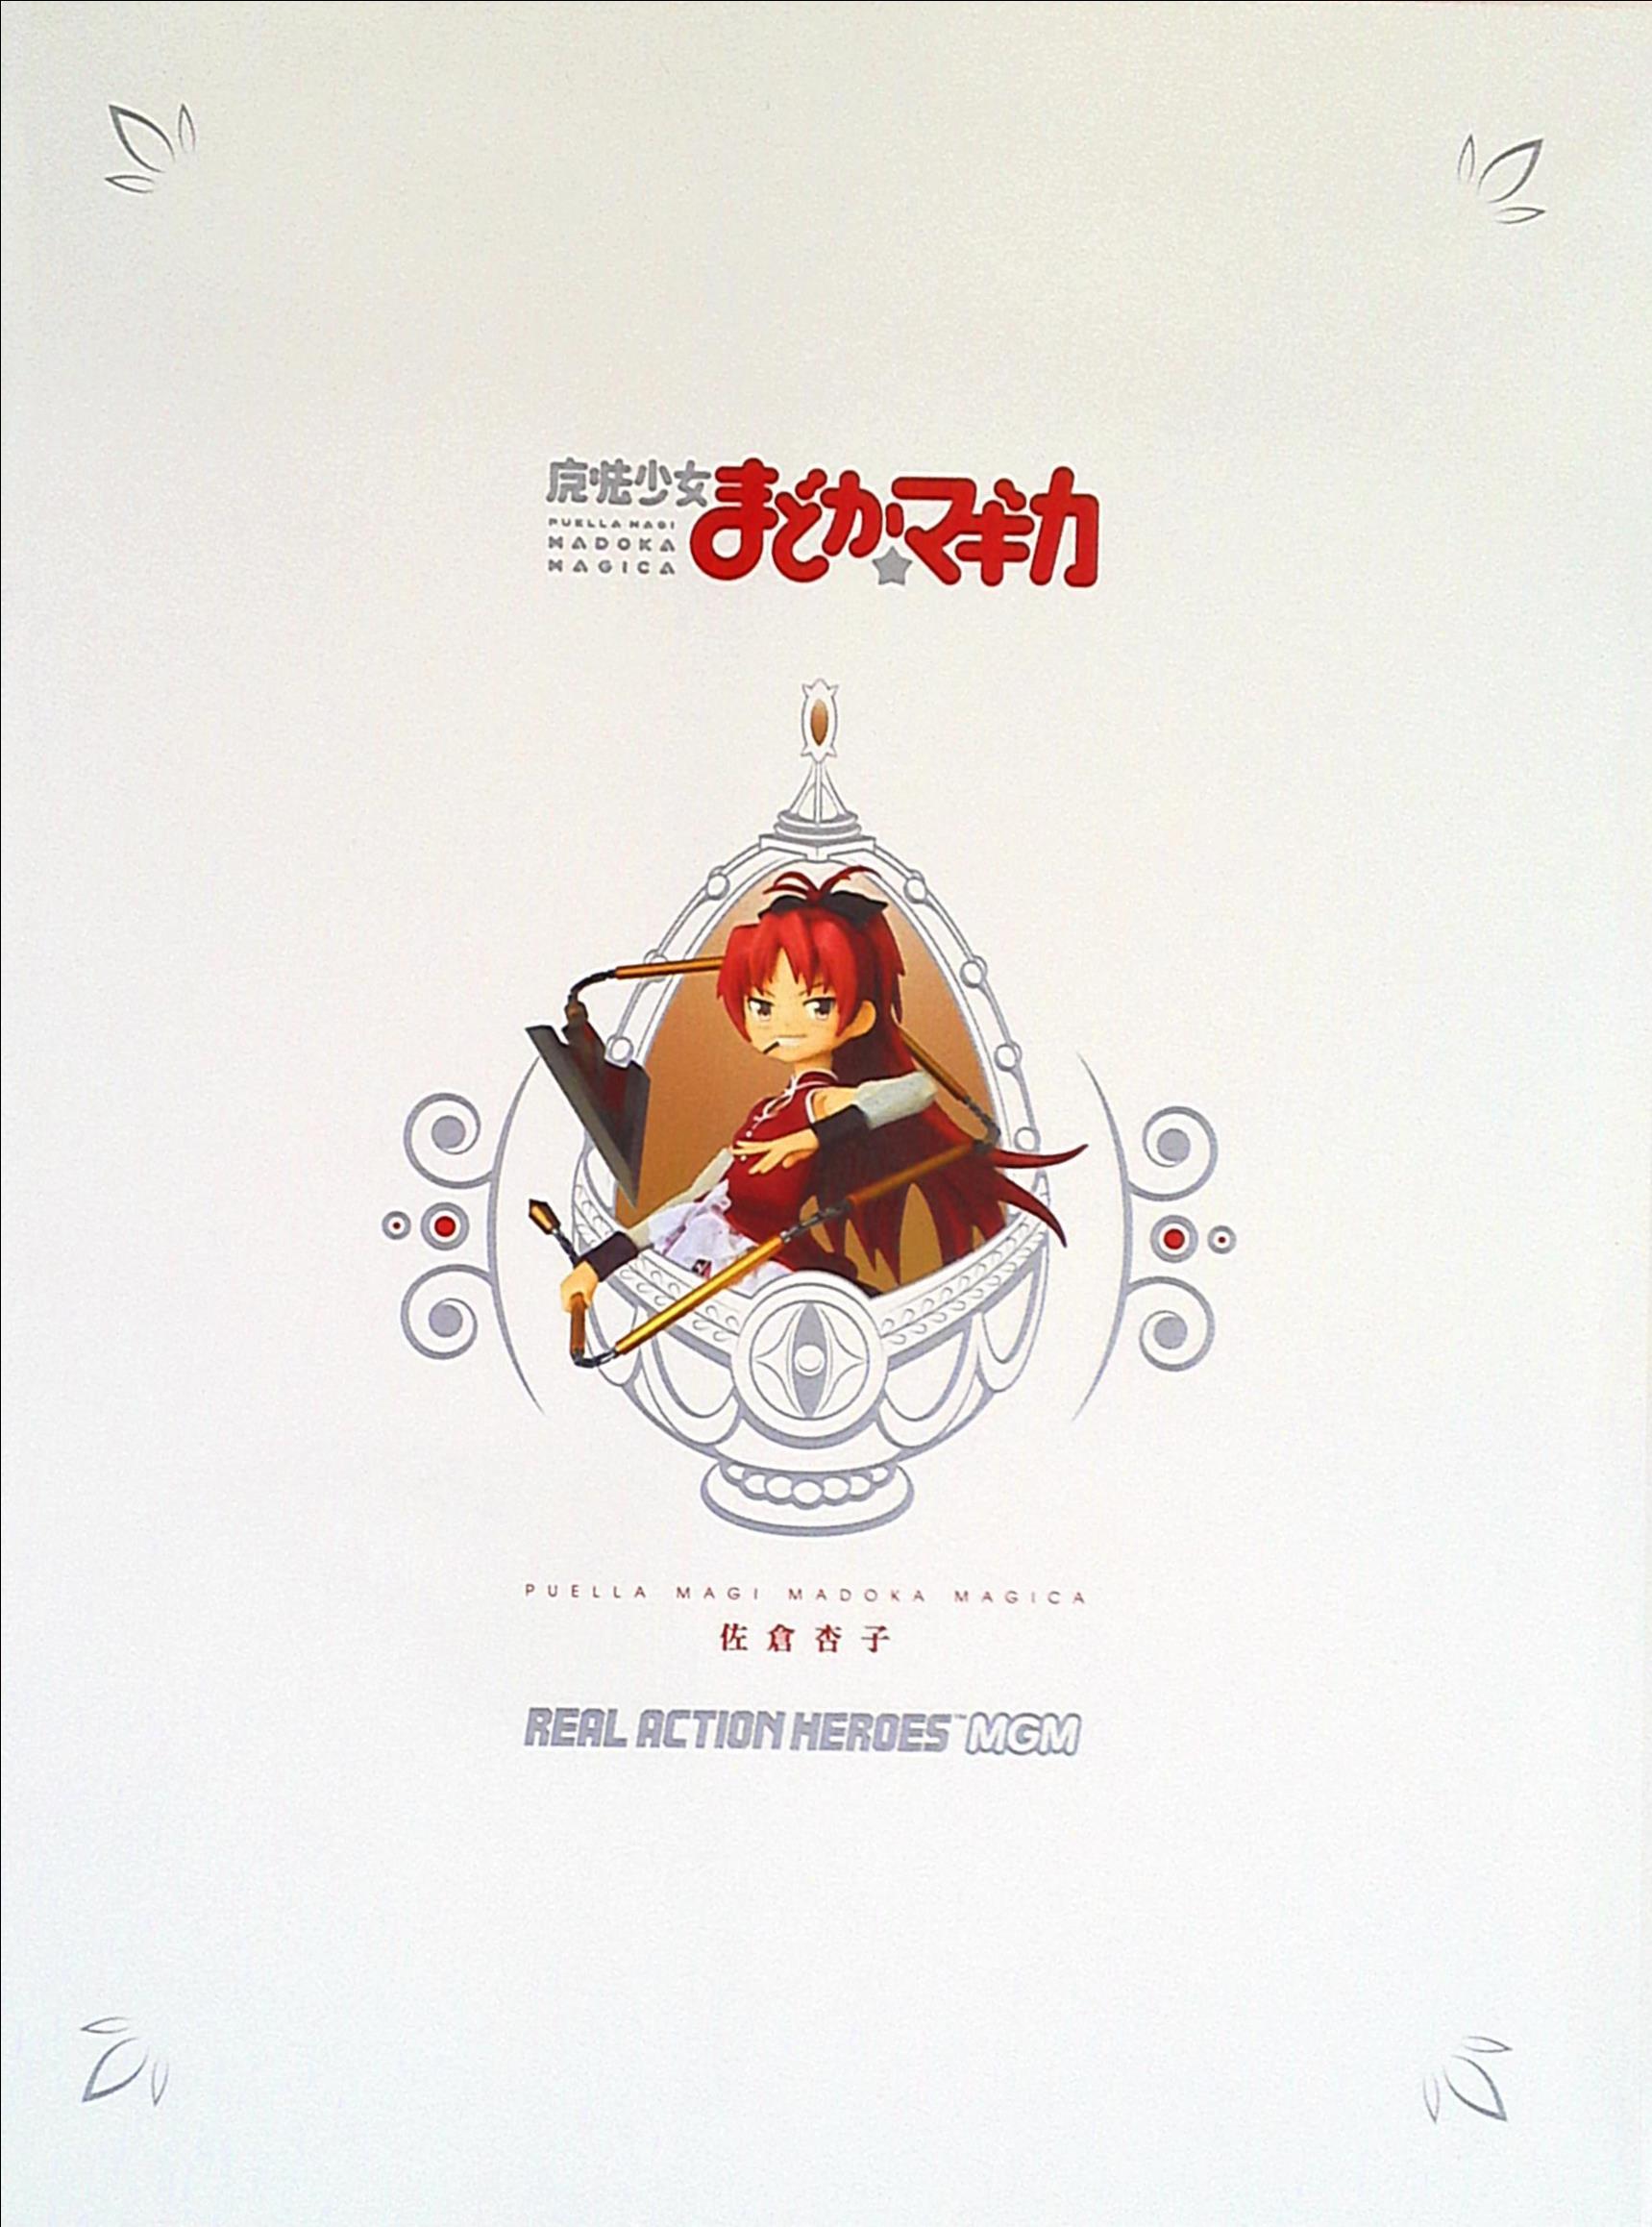 Medicom Toy RAH 624 Puella Magi Madoka Magica MGM Sakura Kyoko Figure from Japan